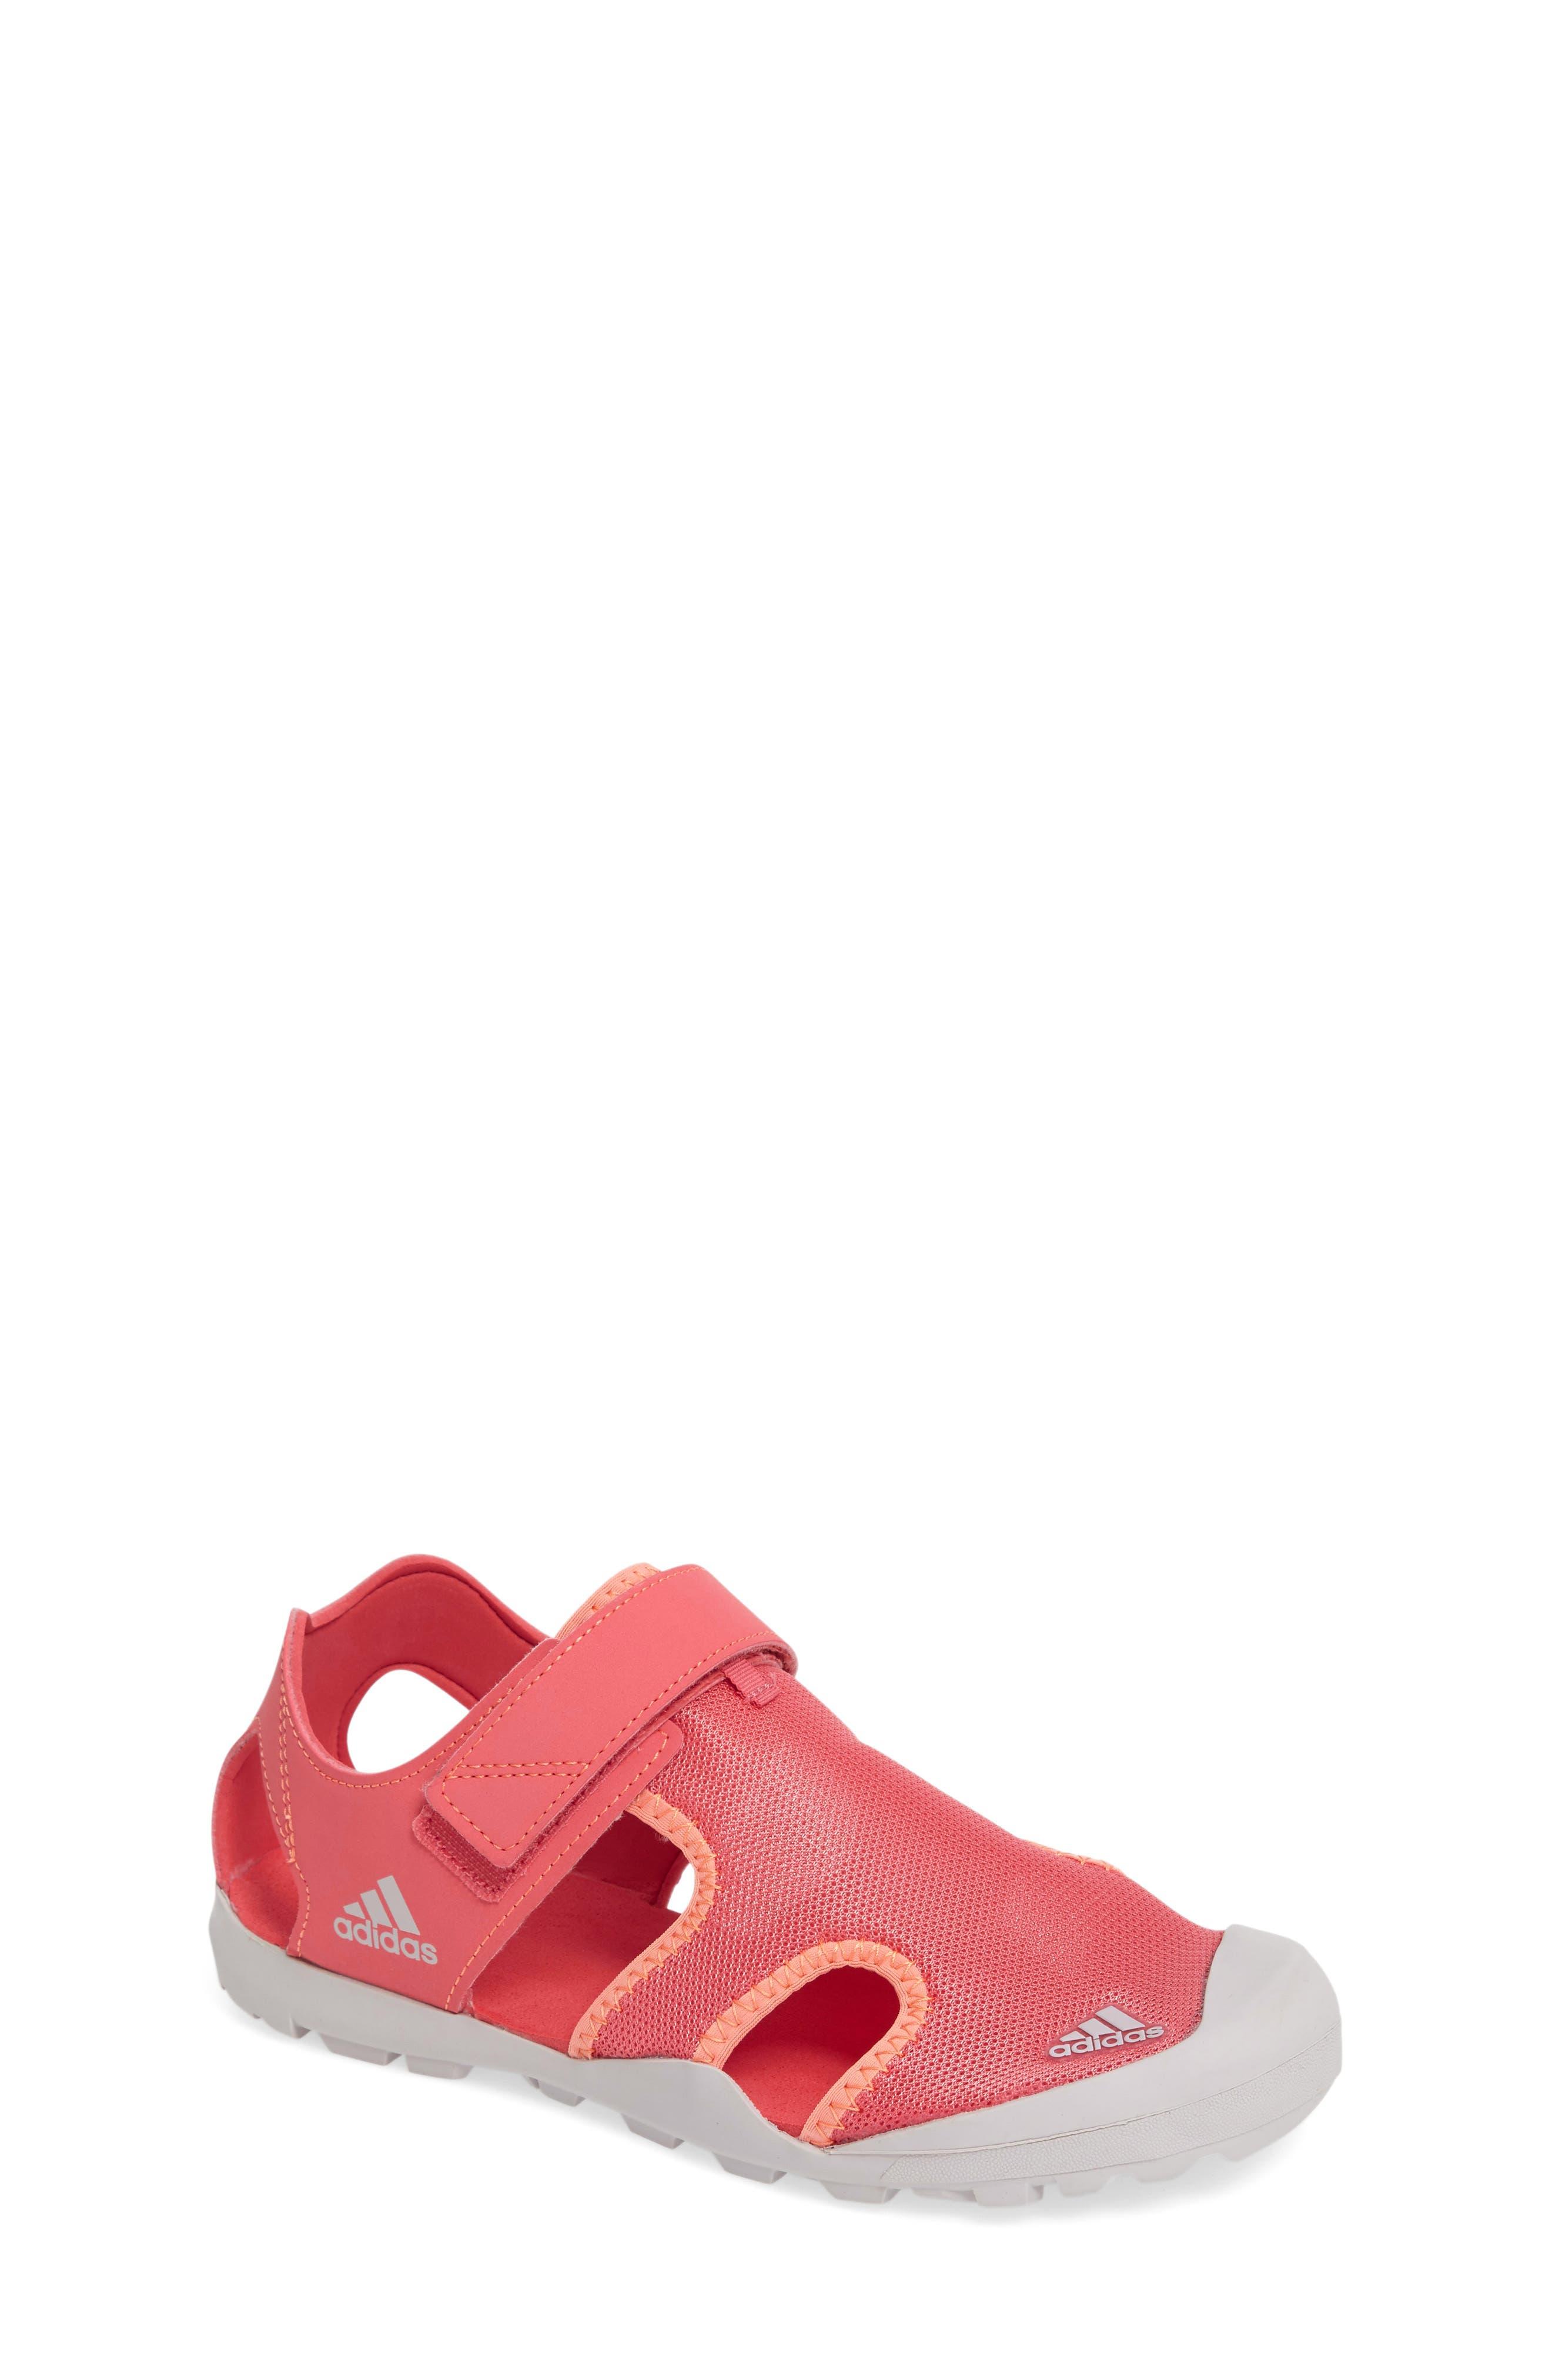 adidas Captain Toey Sandal (Toddler, Little Kid & Big Kid)